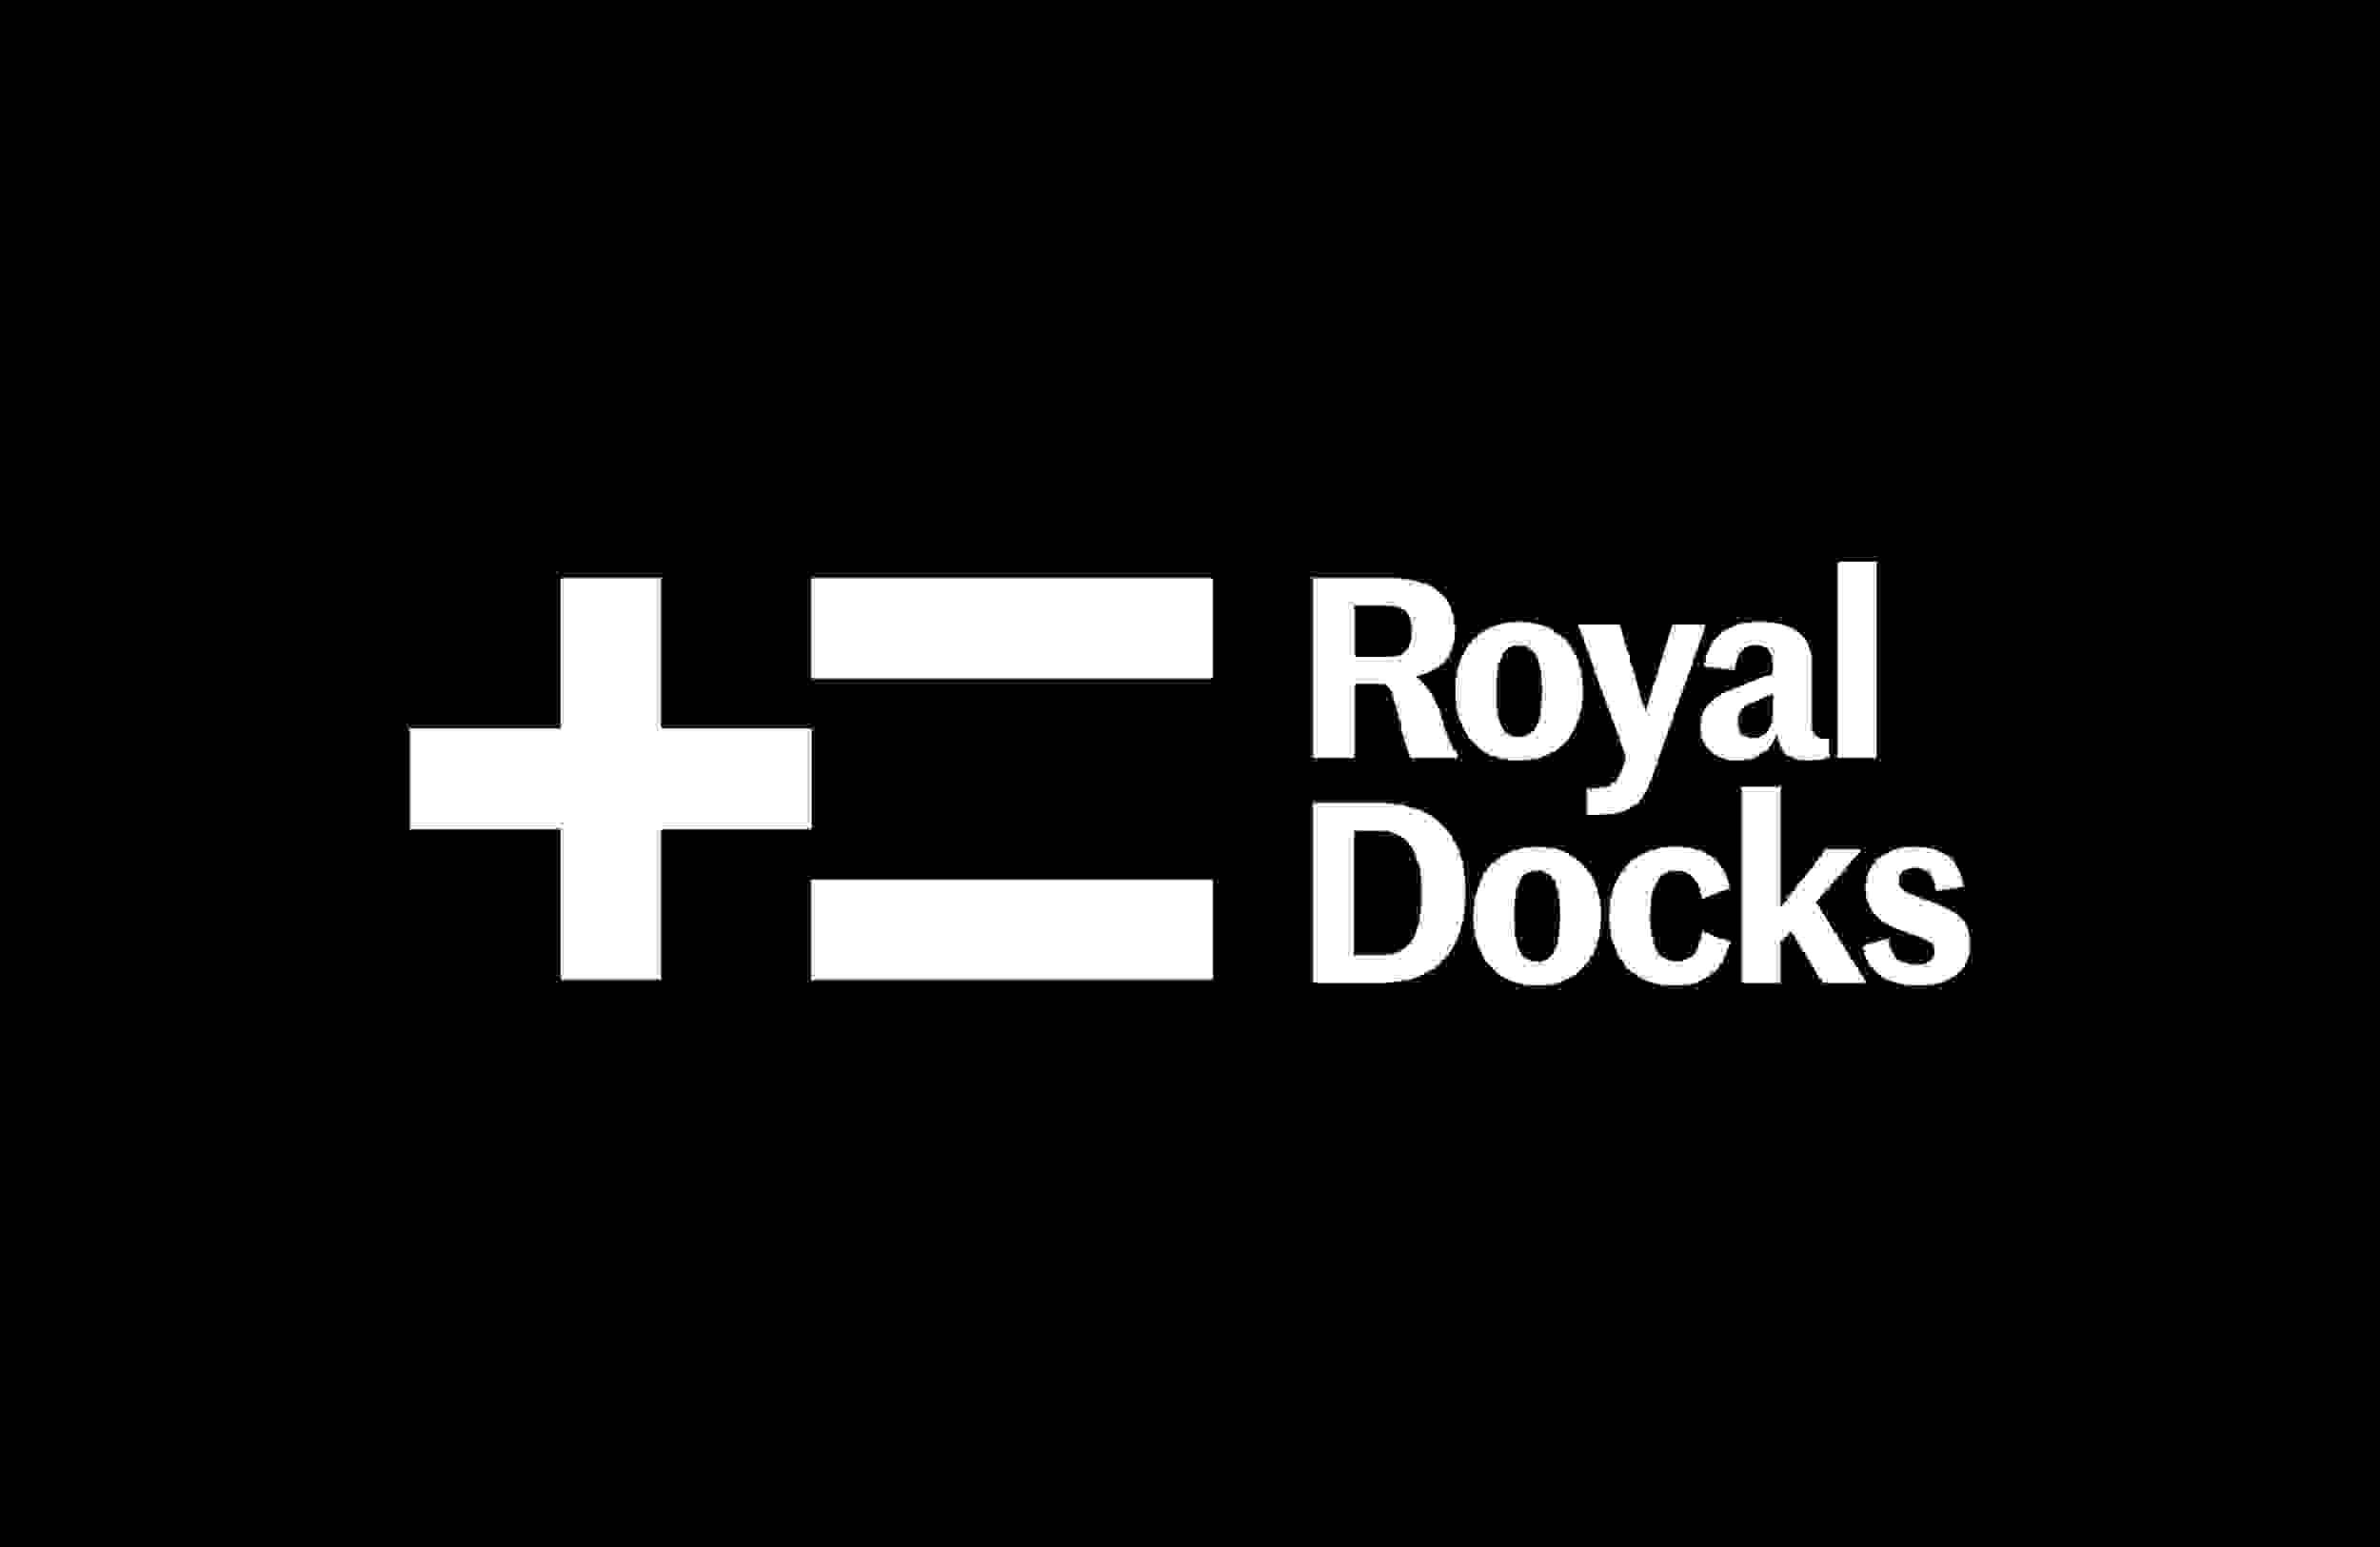 The Royal Docks logo